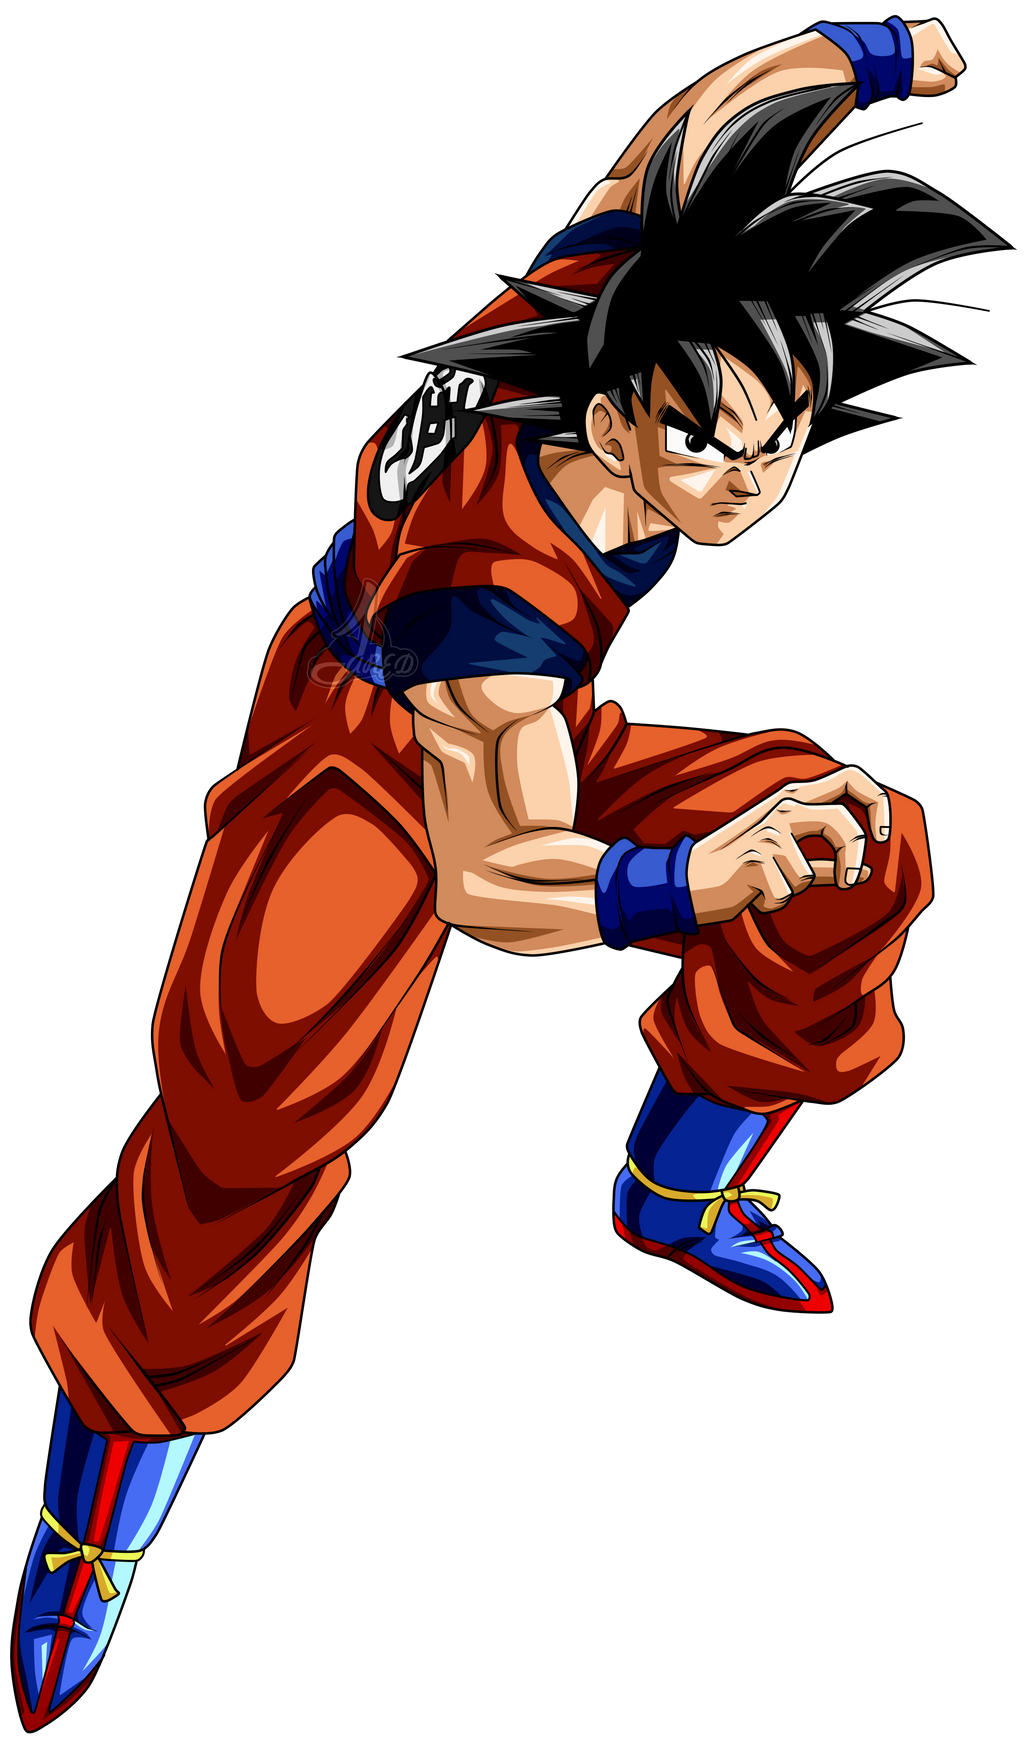 Son Goku DBS v2 L by jaredsongohan on DeviantArt